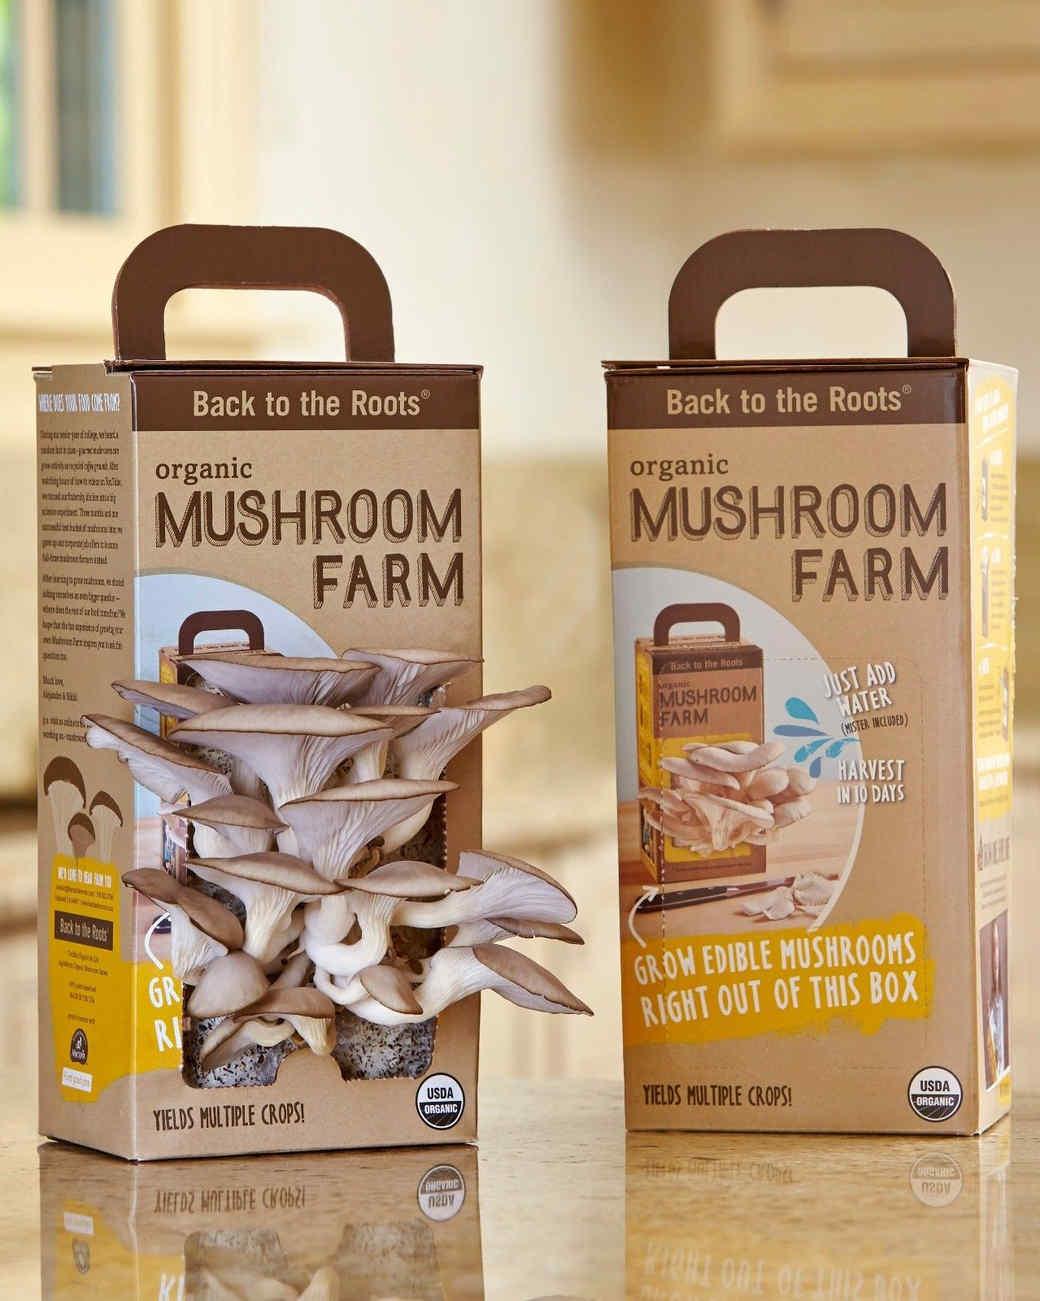 back-to-the-roots-mushroom-farm-1114.jpg